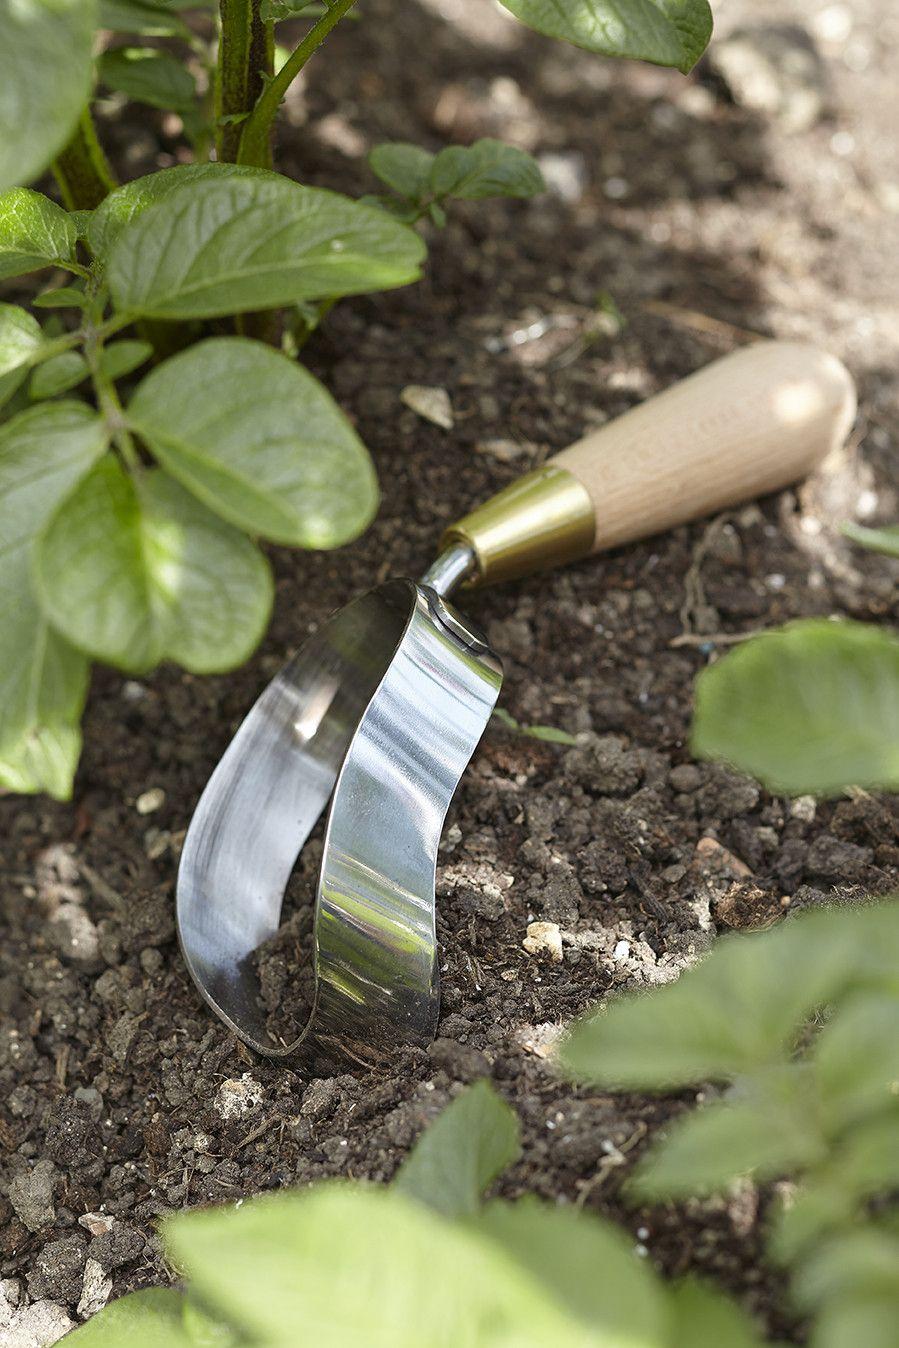 Gardener S Ergo Hoe Garden Shop Sophie Conran Hard Landscaping Ideas